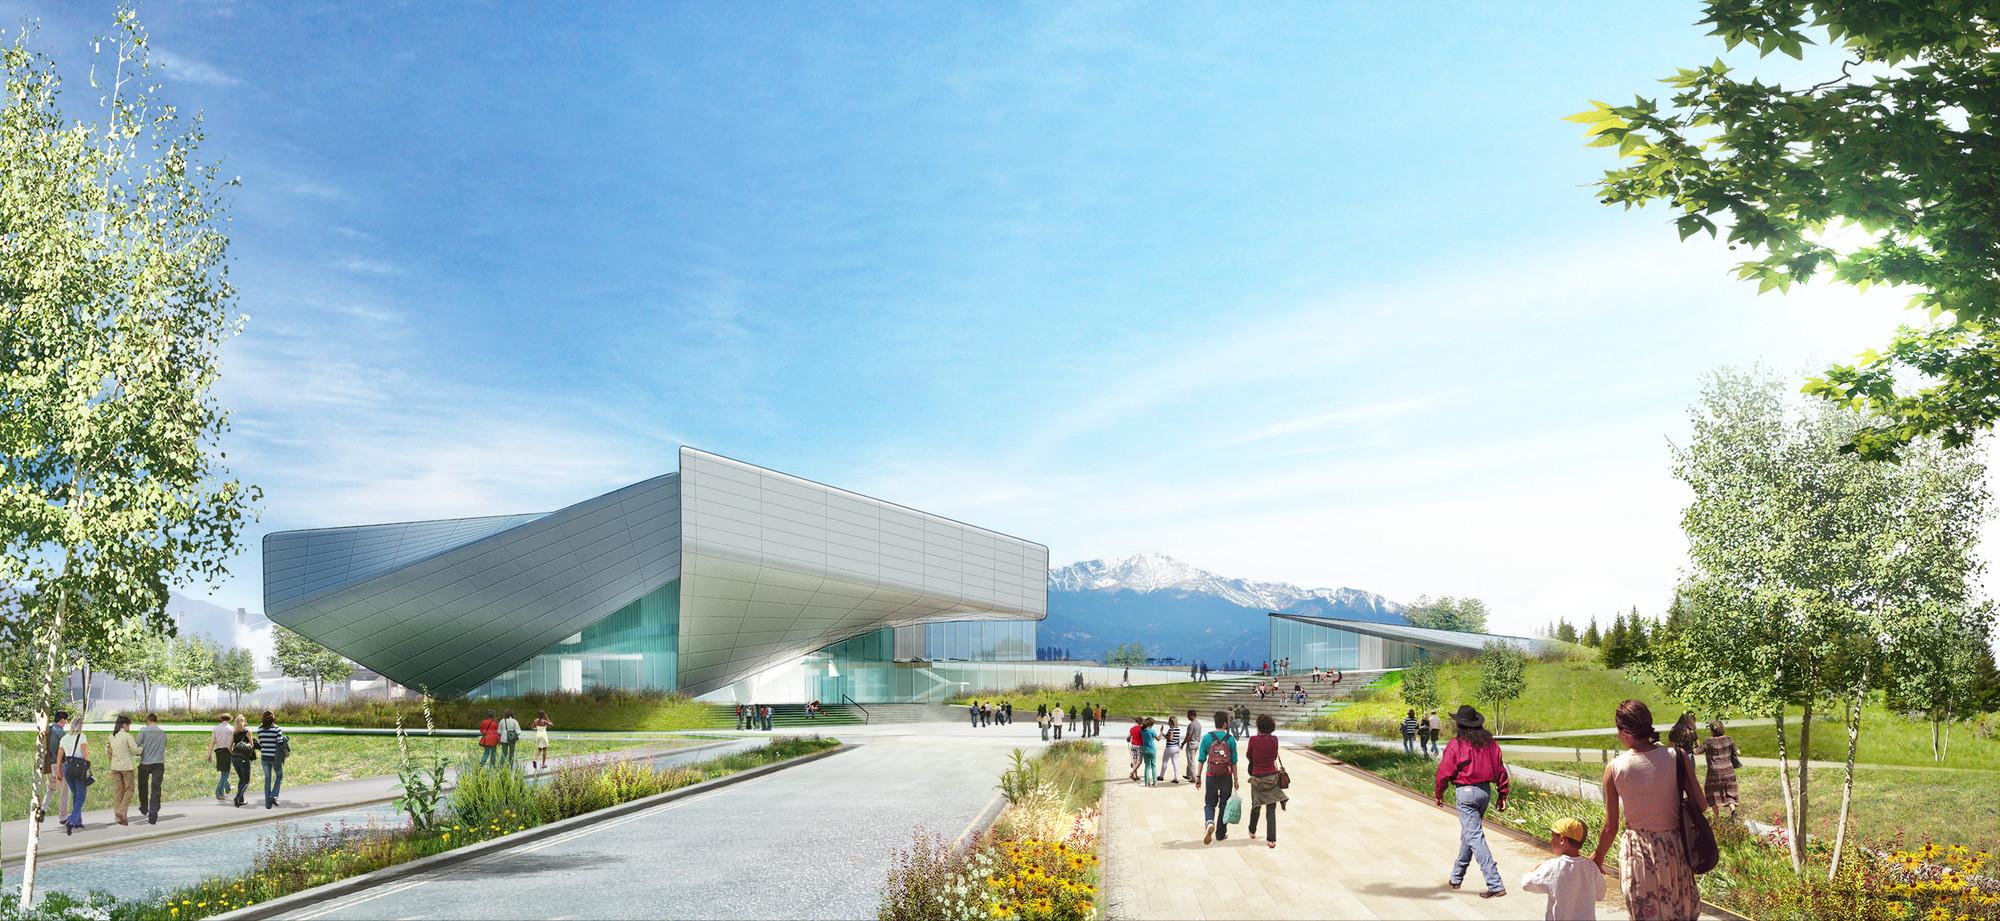 Diller Scofidio + Renfro presenta diseño del Museo Olímpico de Estados Unidos, Cortesía de Diller Scofidio + Renfro